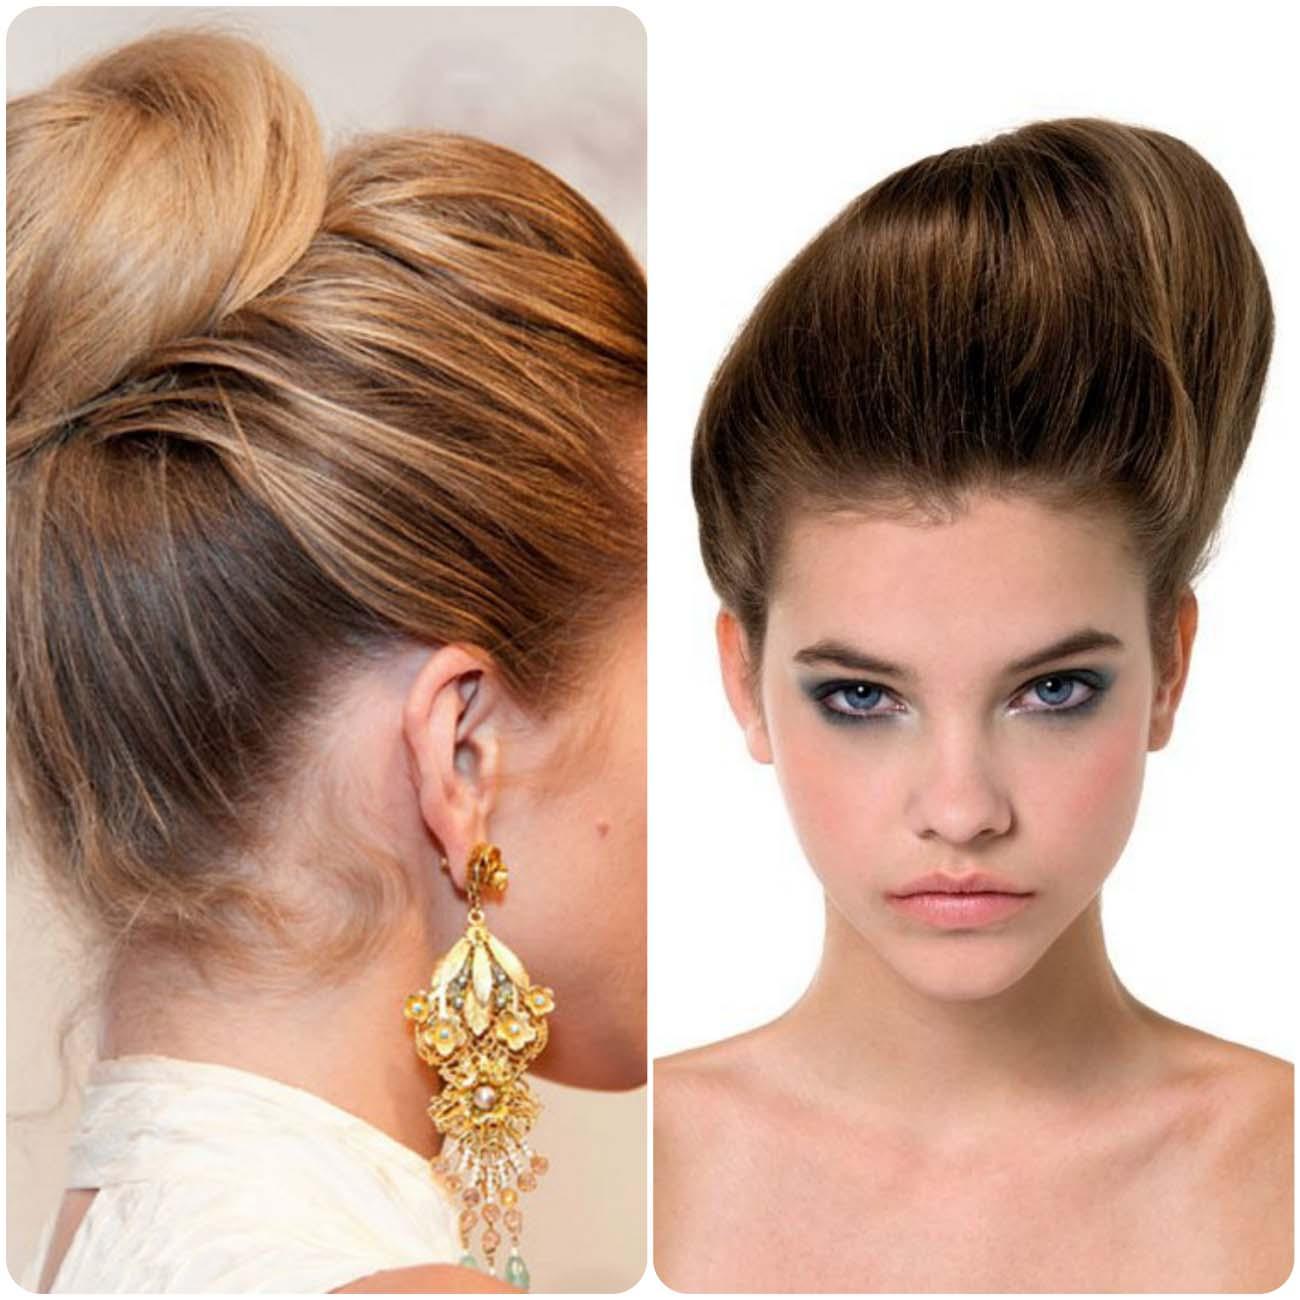 freckled_fox_hair_tutorial_the_bouffant_bun_summer_winter_fall_spring_long_hair_tutorial_pi  n1_Fotor_Collage